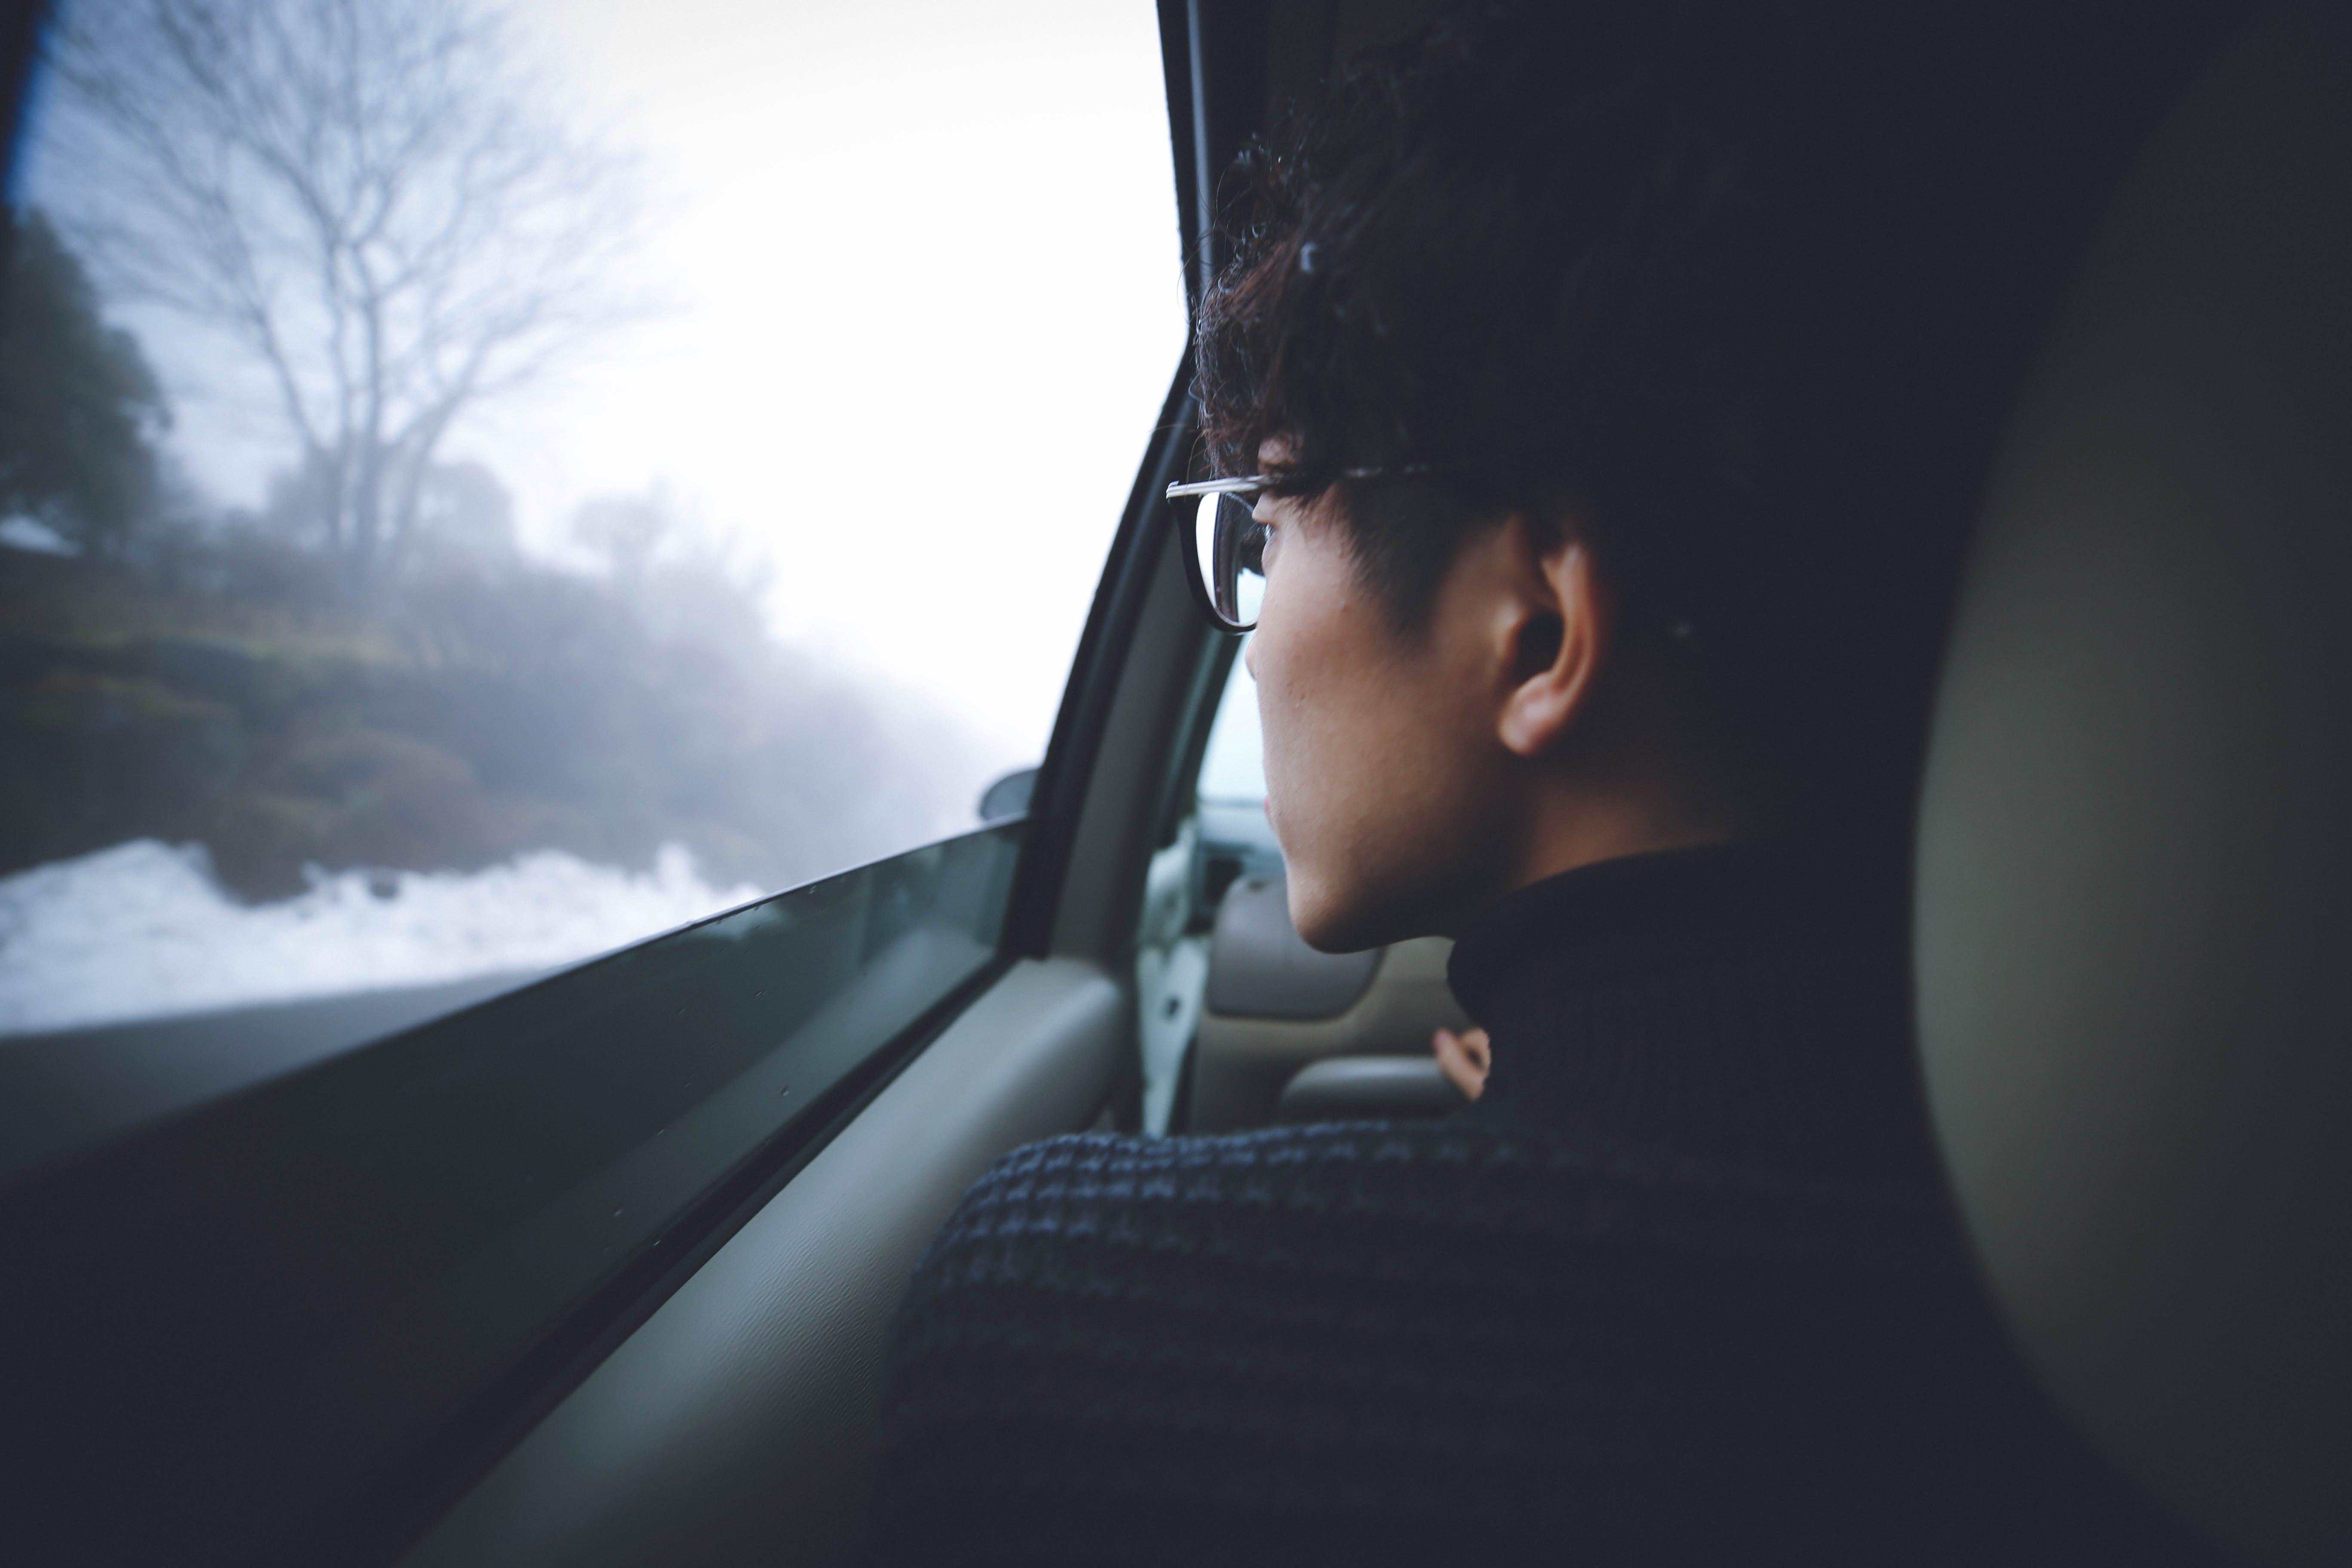 Man Wearing Eyeglasses Inside the Car